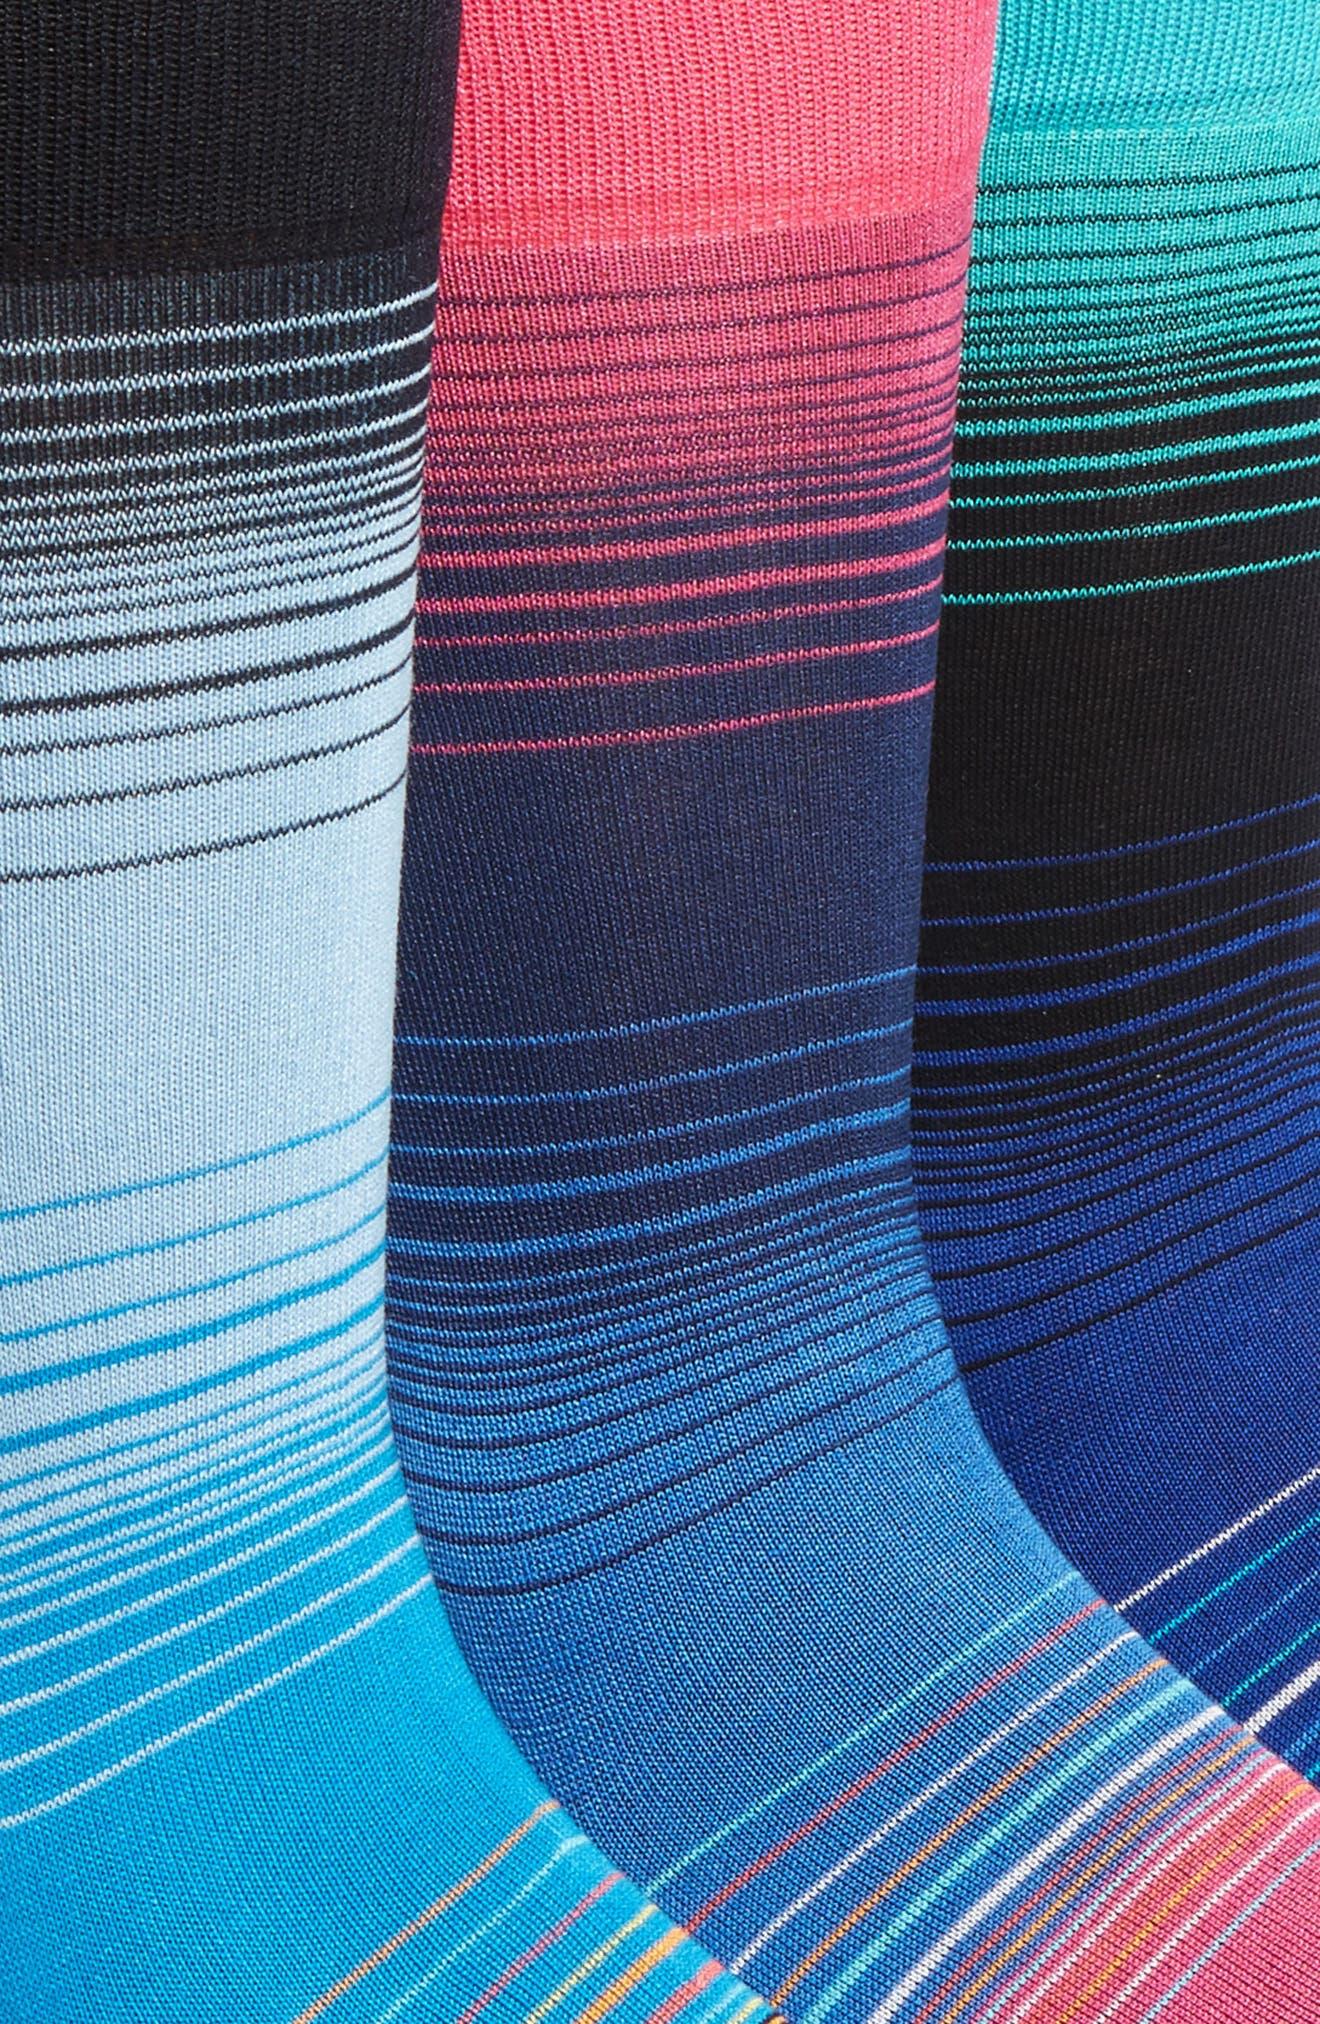 Alternate Image 2  - Bugatchi 3-Pack Cotton Blend Socks